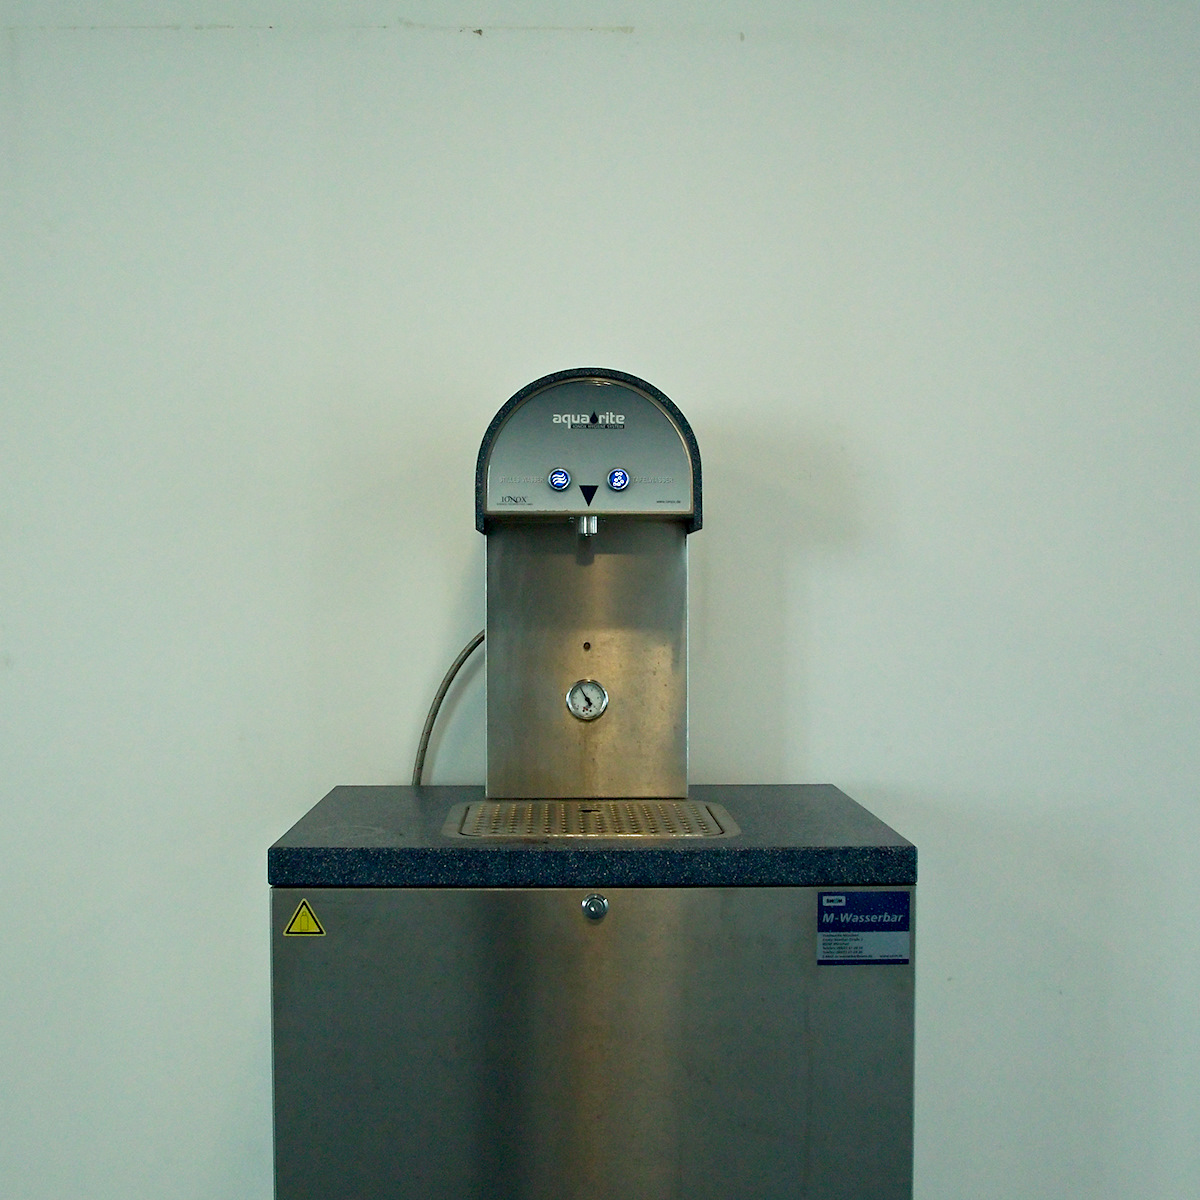 Click to enlarge: Wasserbar [f/7.1, 1/40 sec, 28mm-e, ISO 1600, DMC-G3]